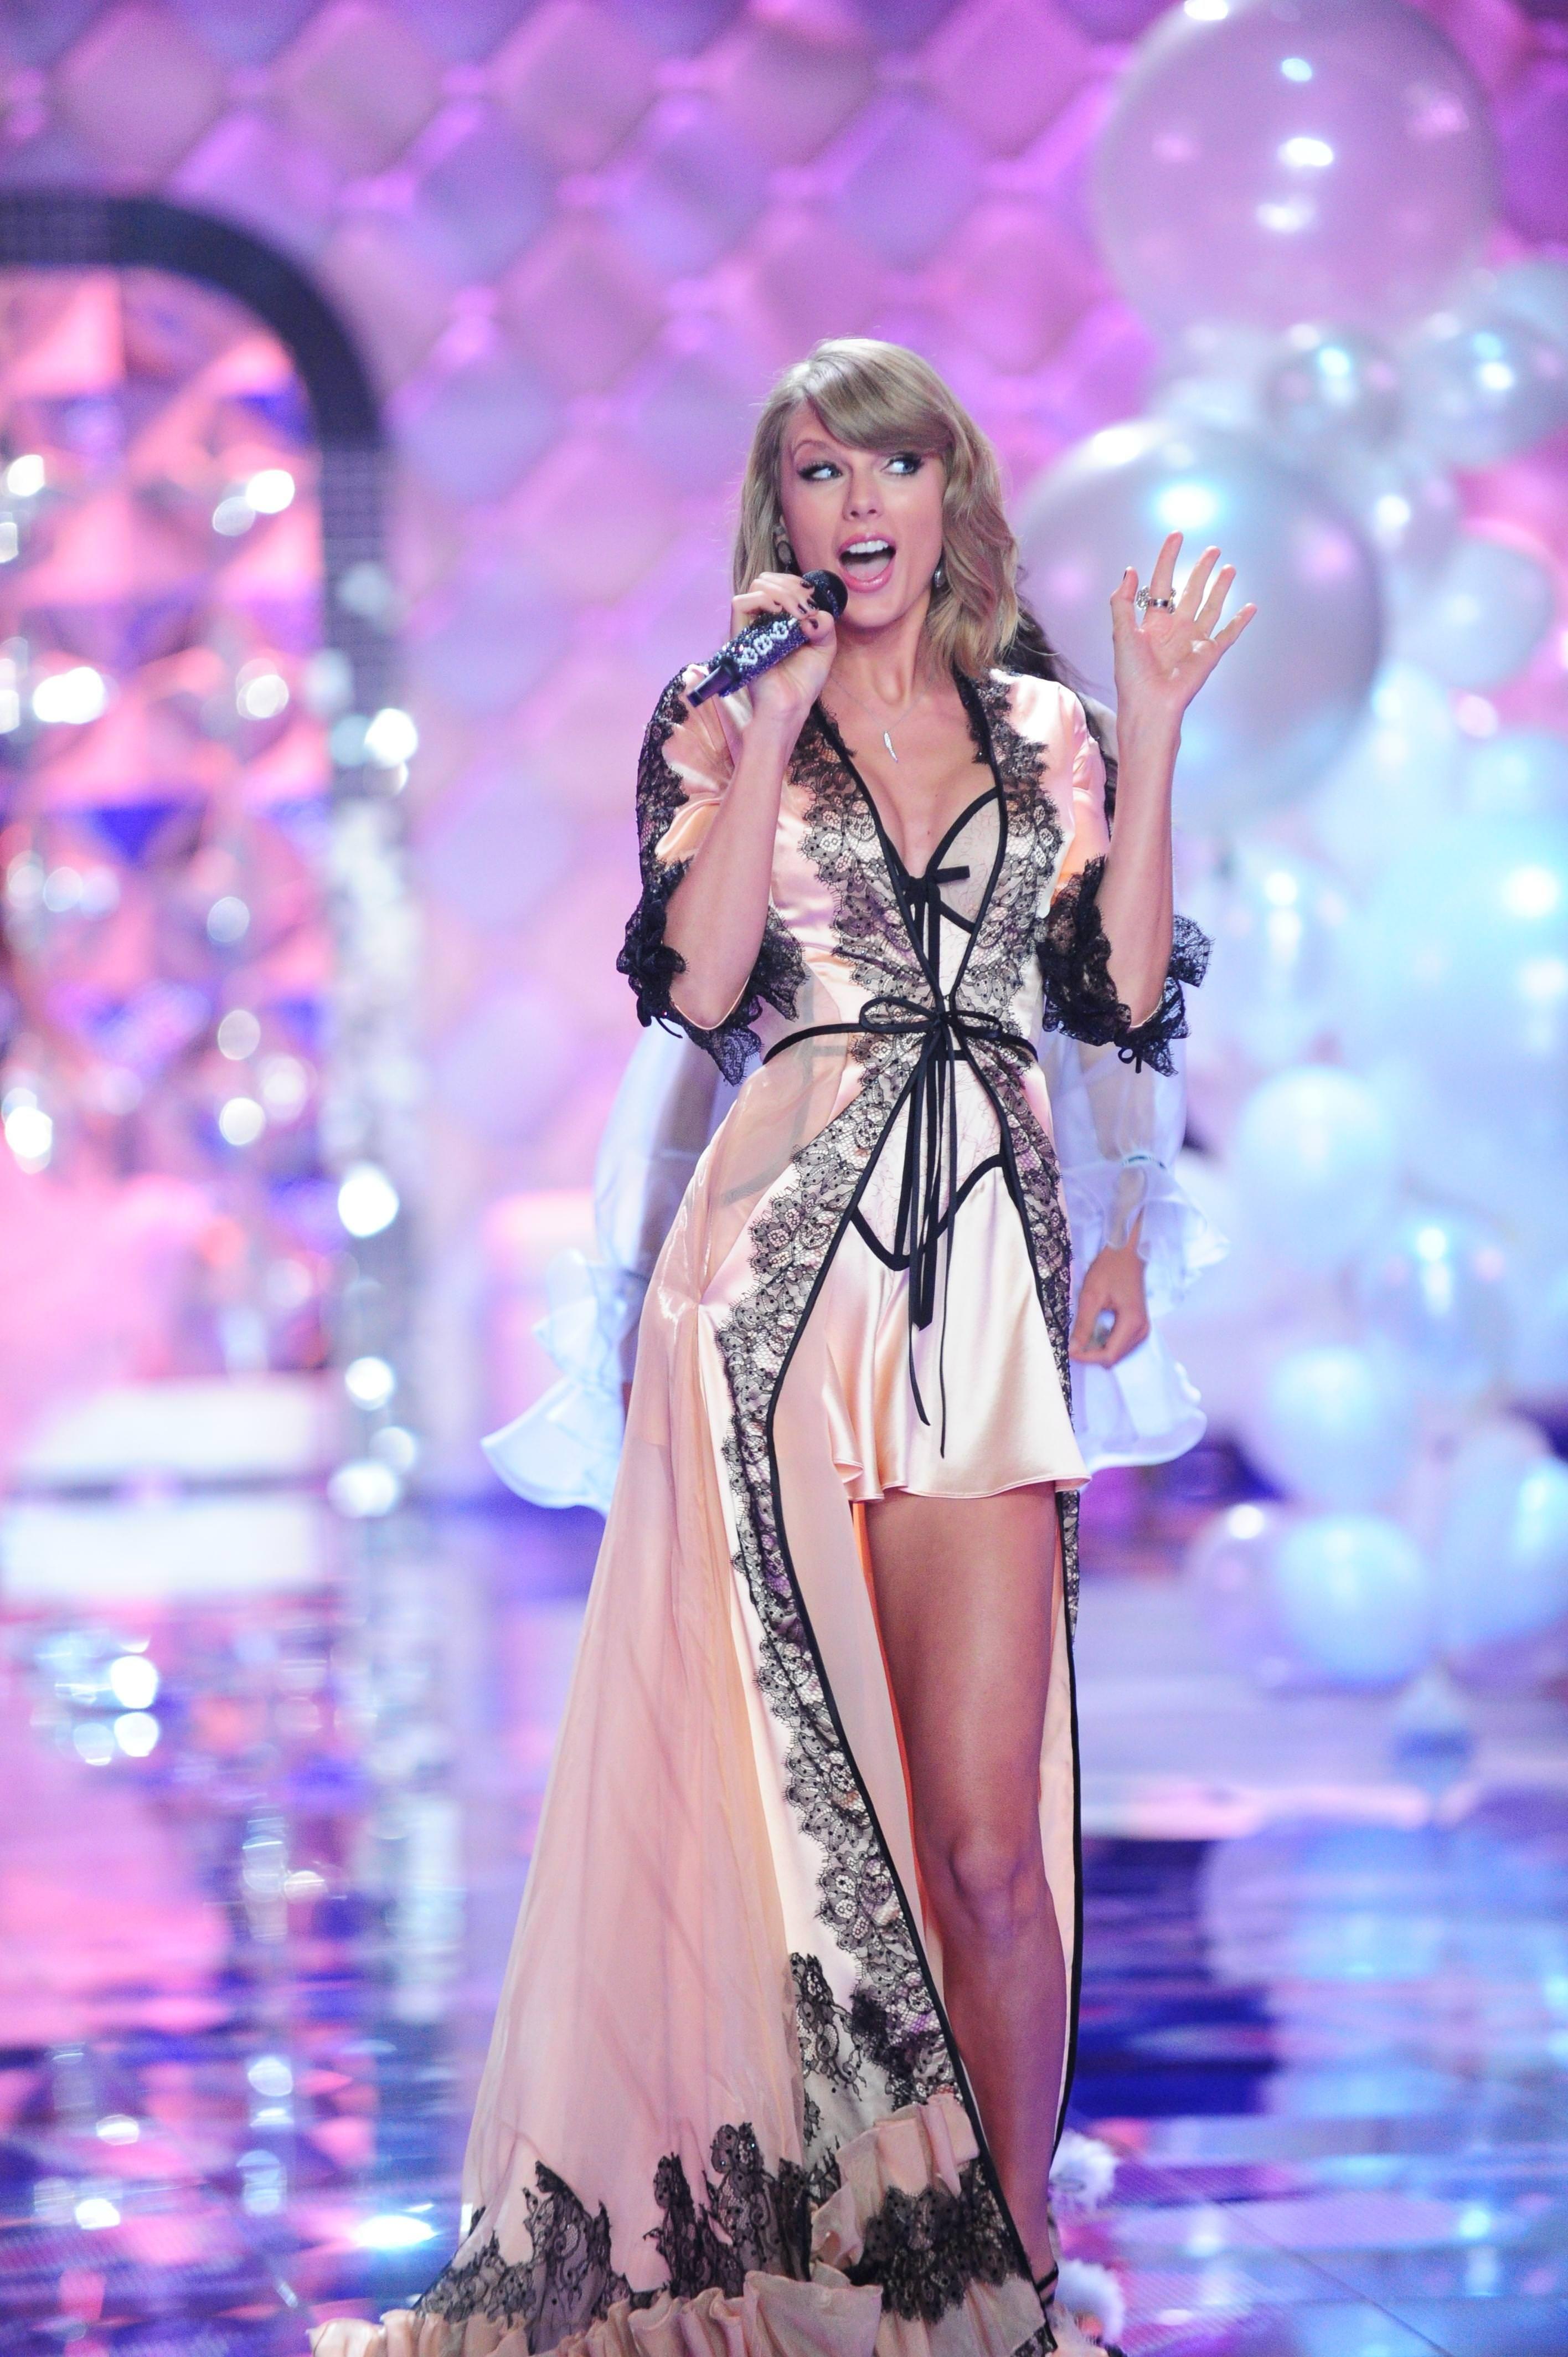 Pin on Taylor Swift Victoria's Secret.